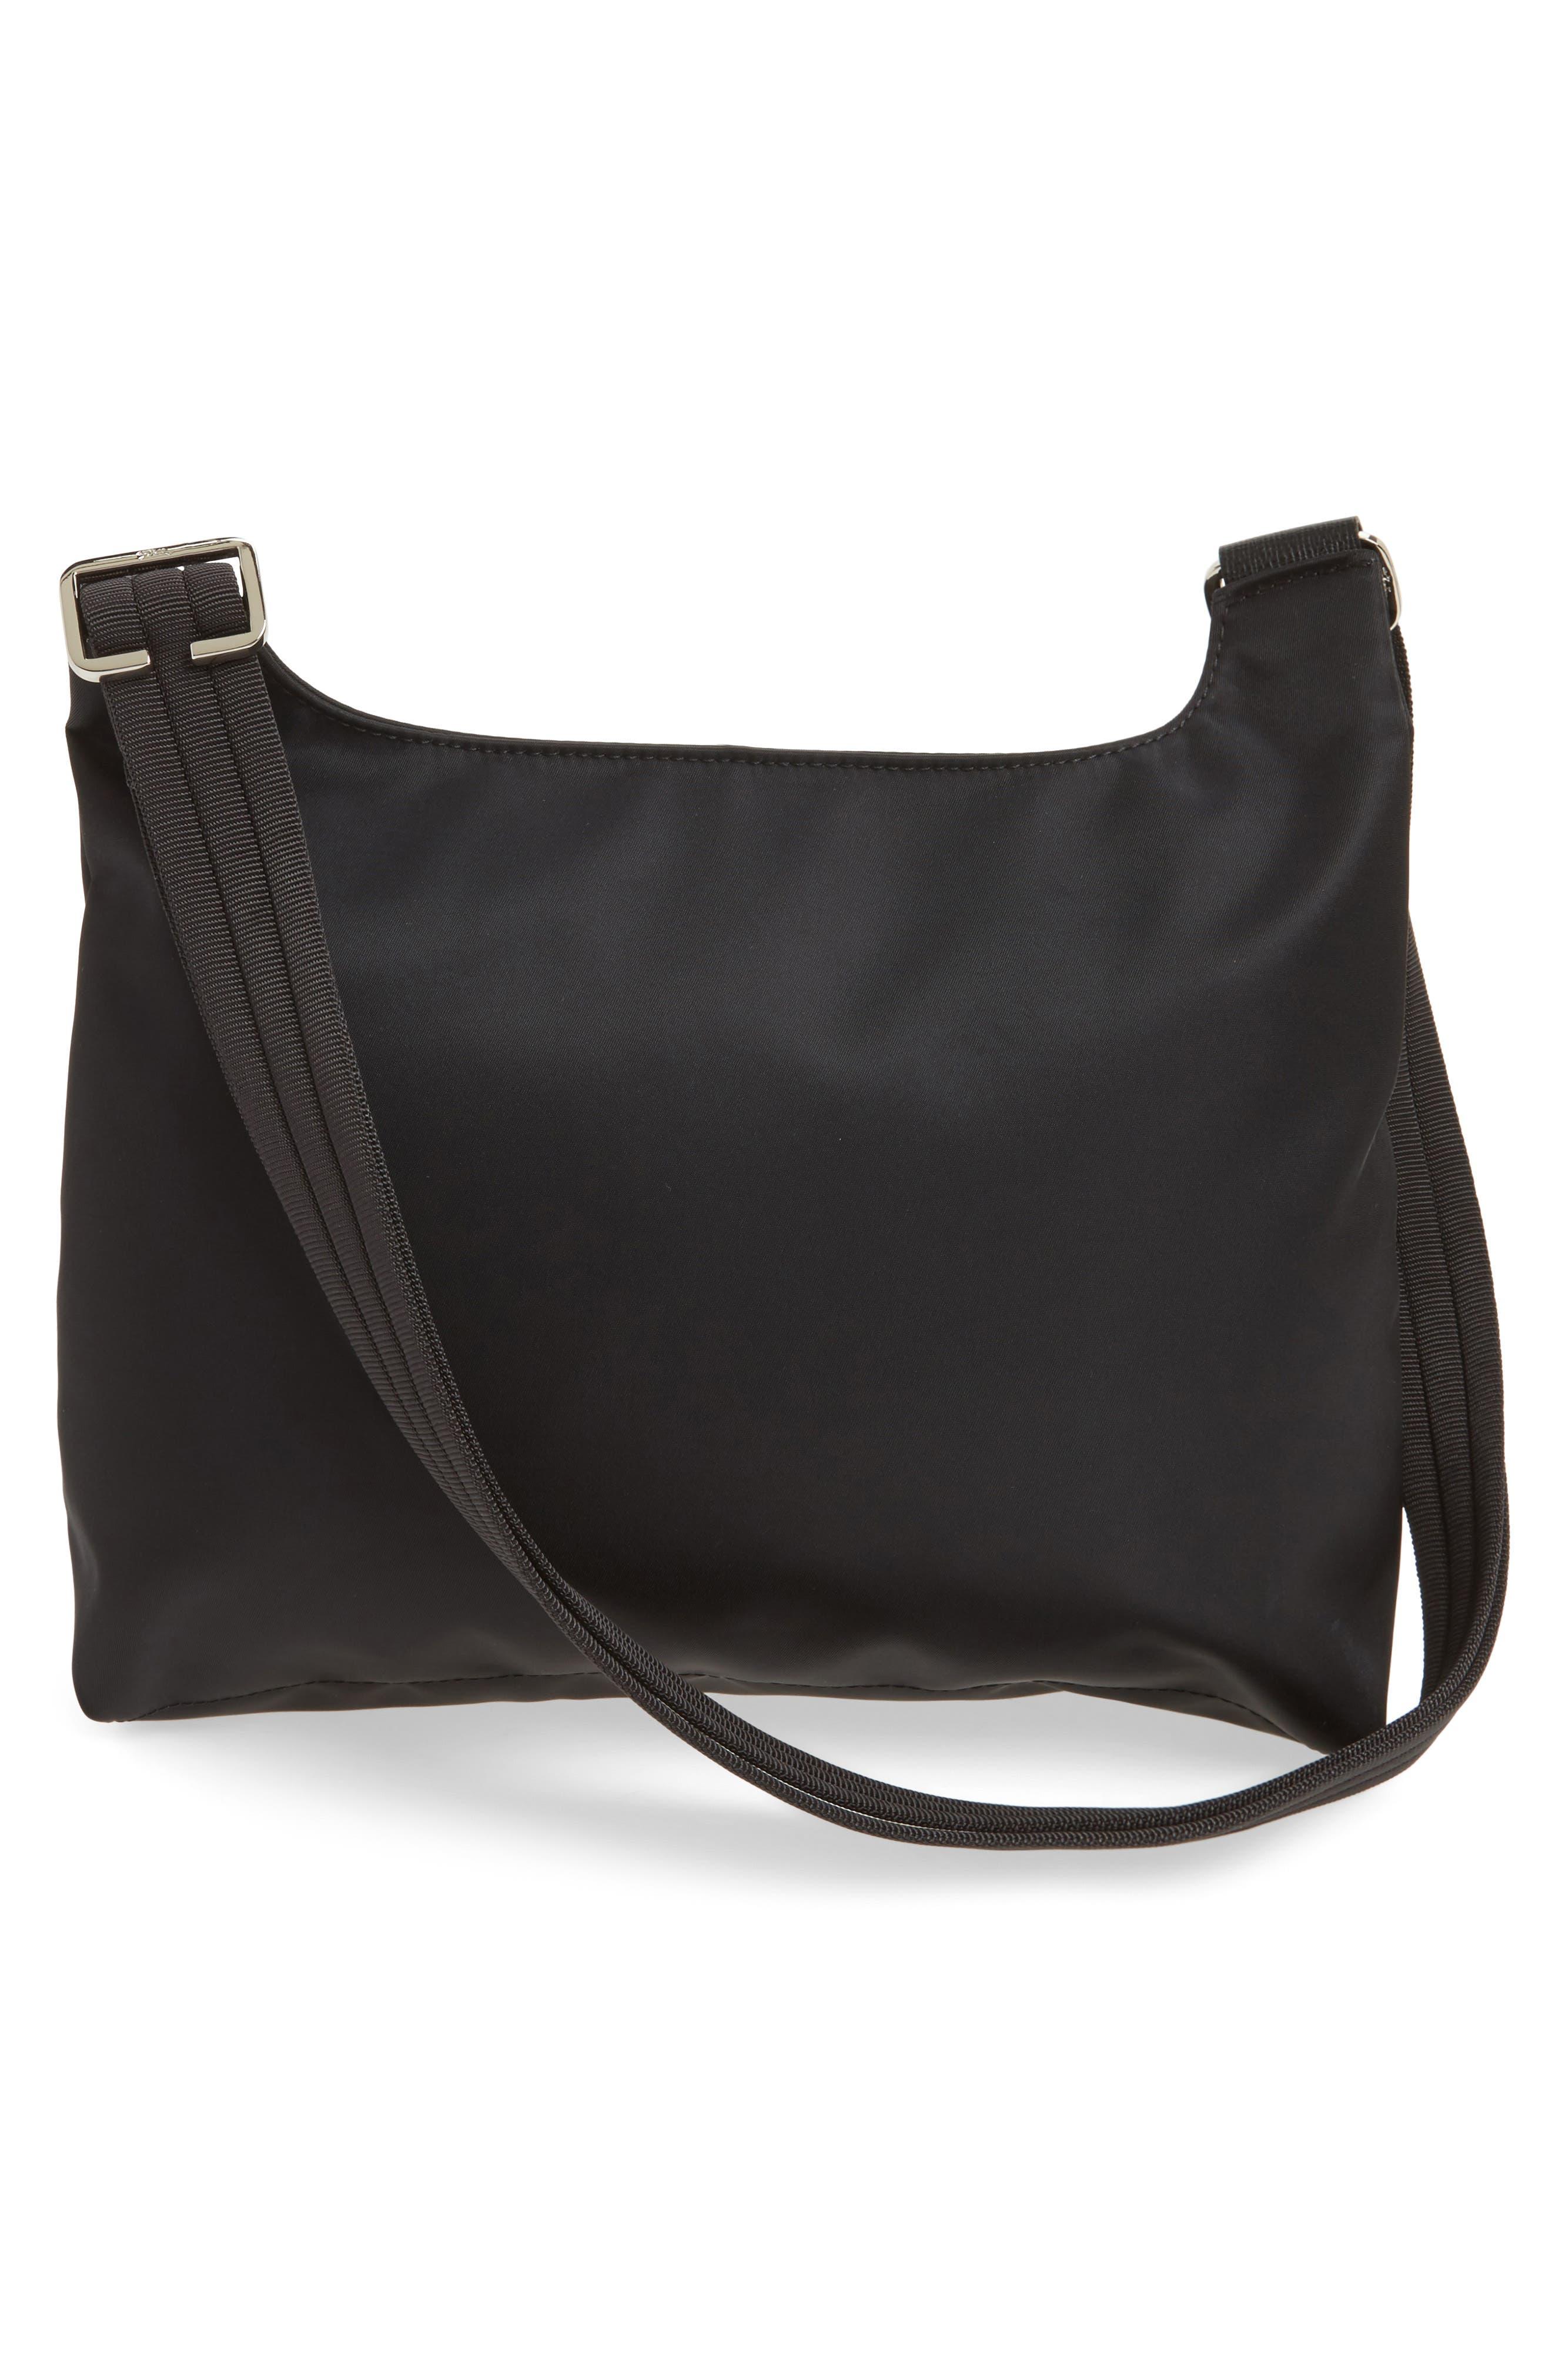 'Le Pliage Neo' Nylon Crossbody Bag,                             Alternate thumbnail 4, color,                             BLACK